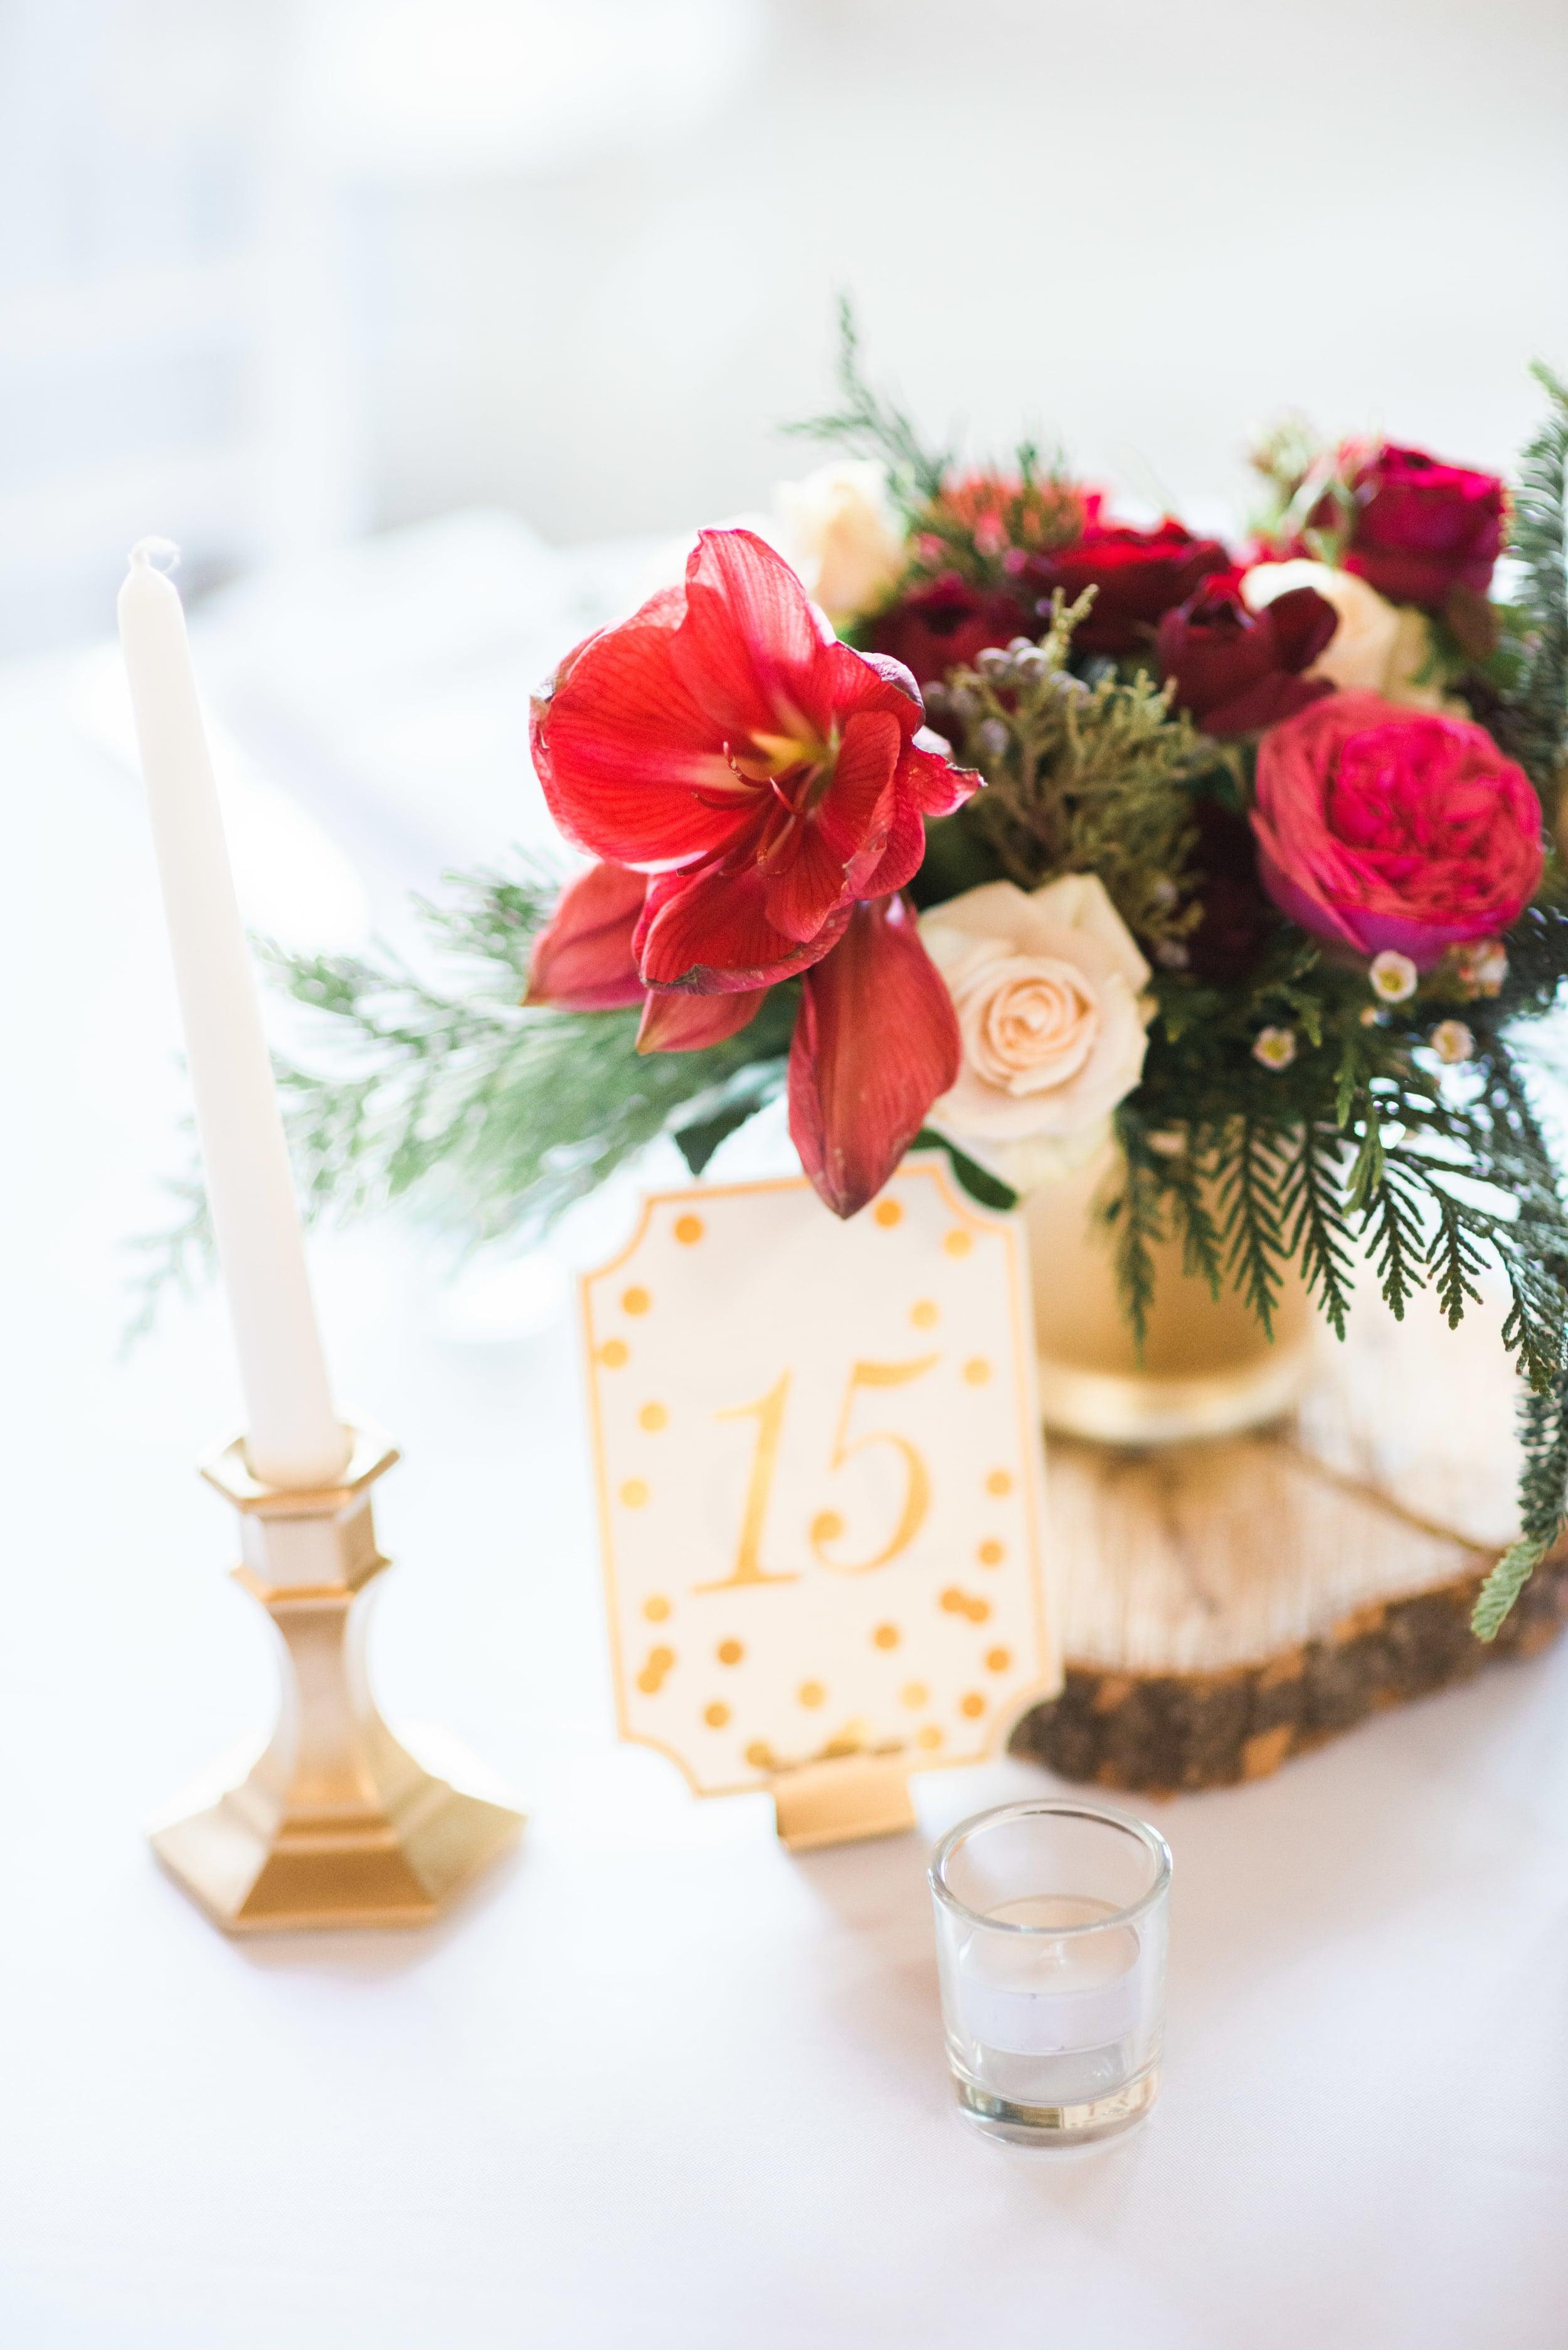 Natalie_Schutt_Photography_Winter_Wedding_San_Luis_Obispo-62.jpg